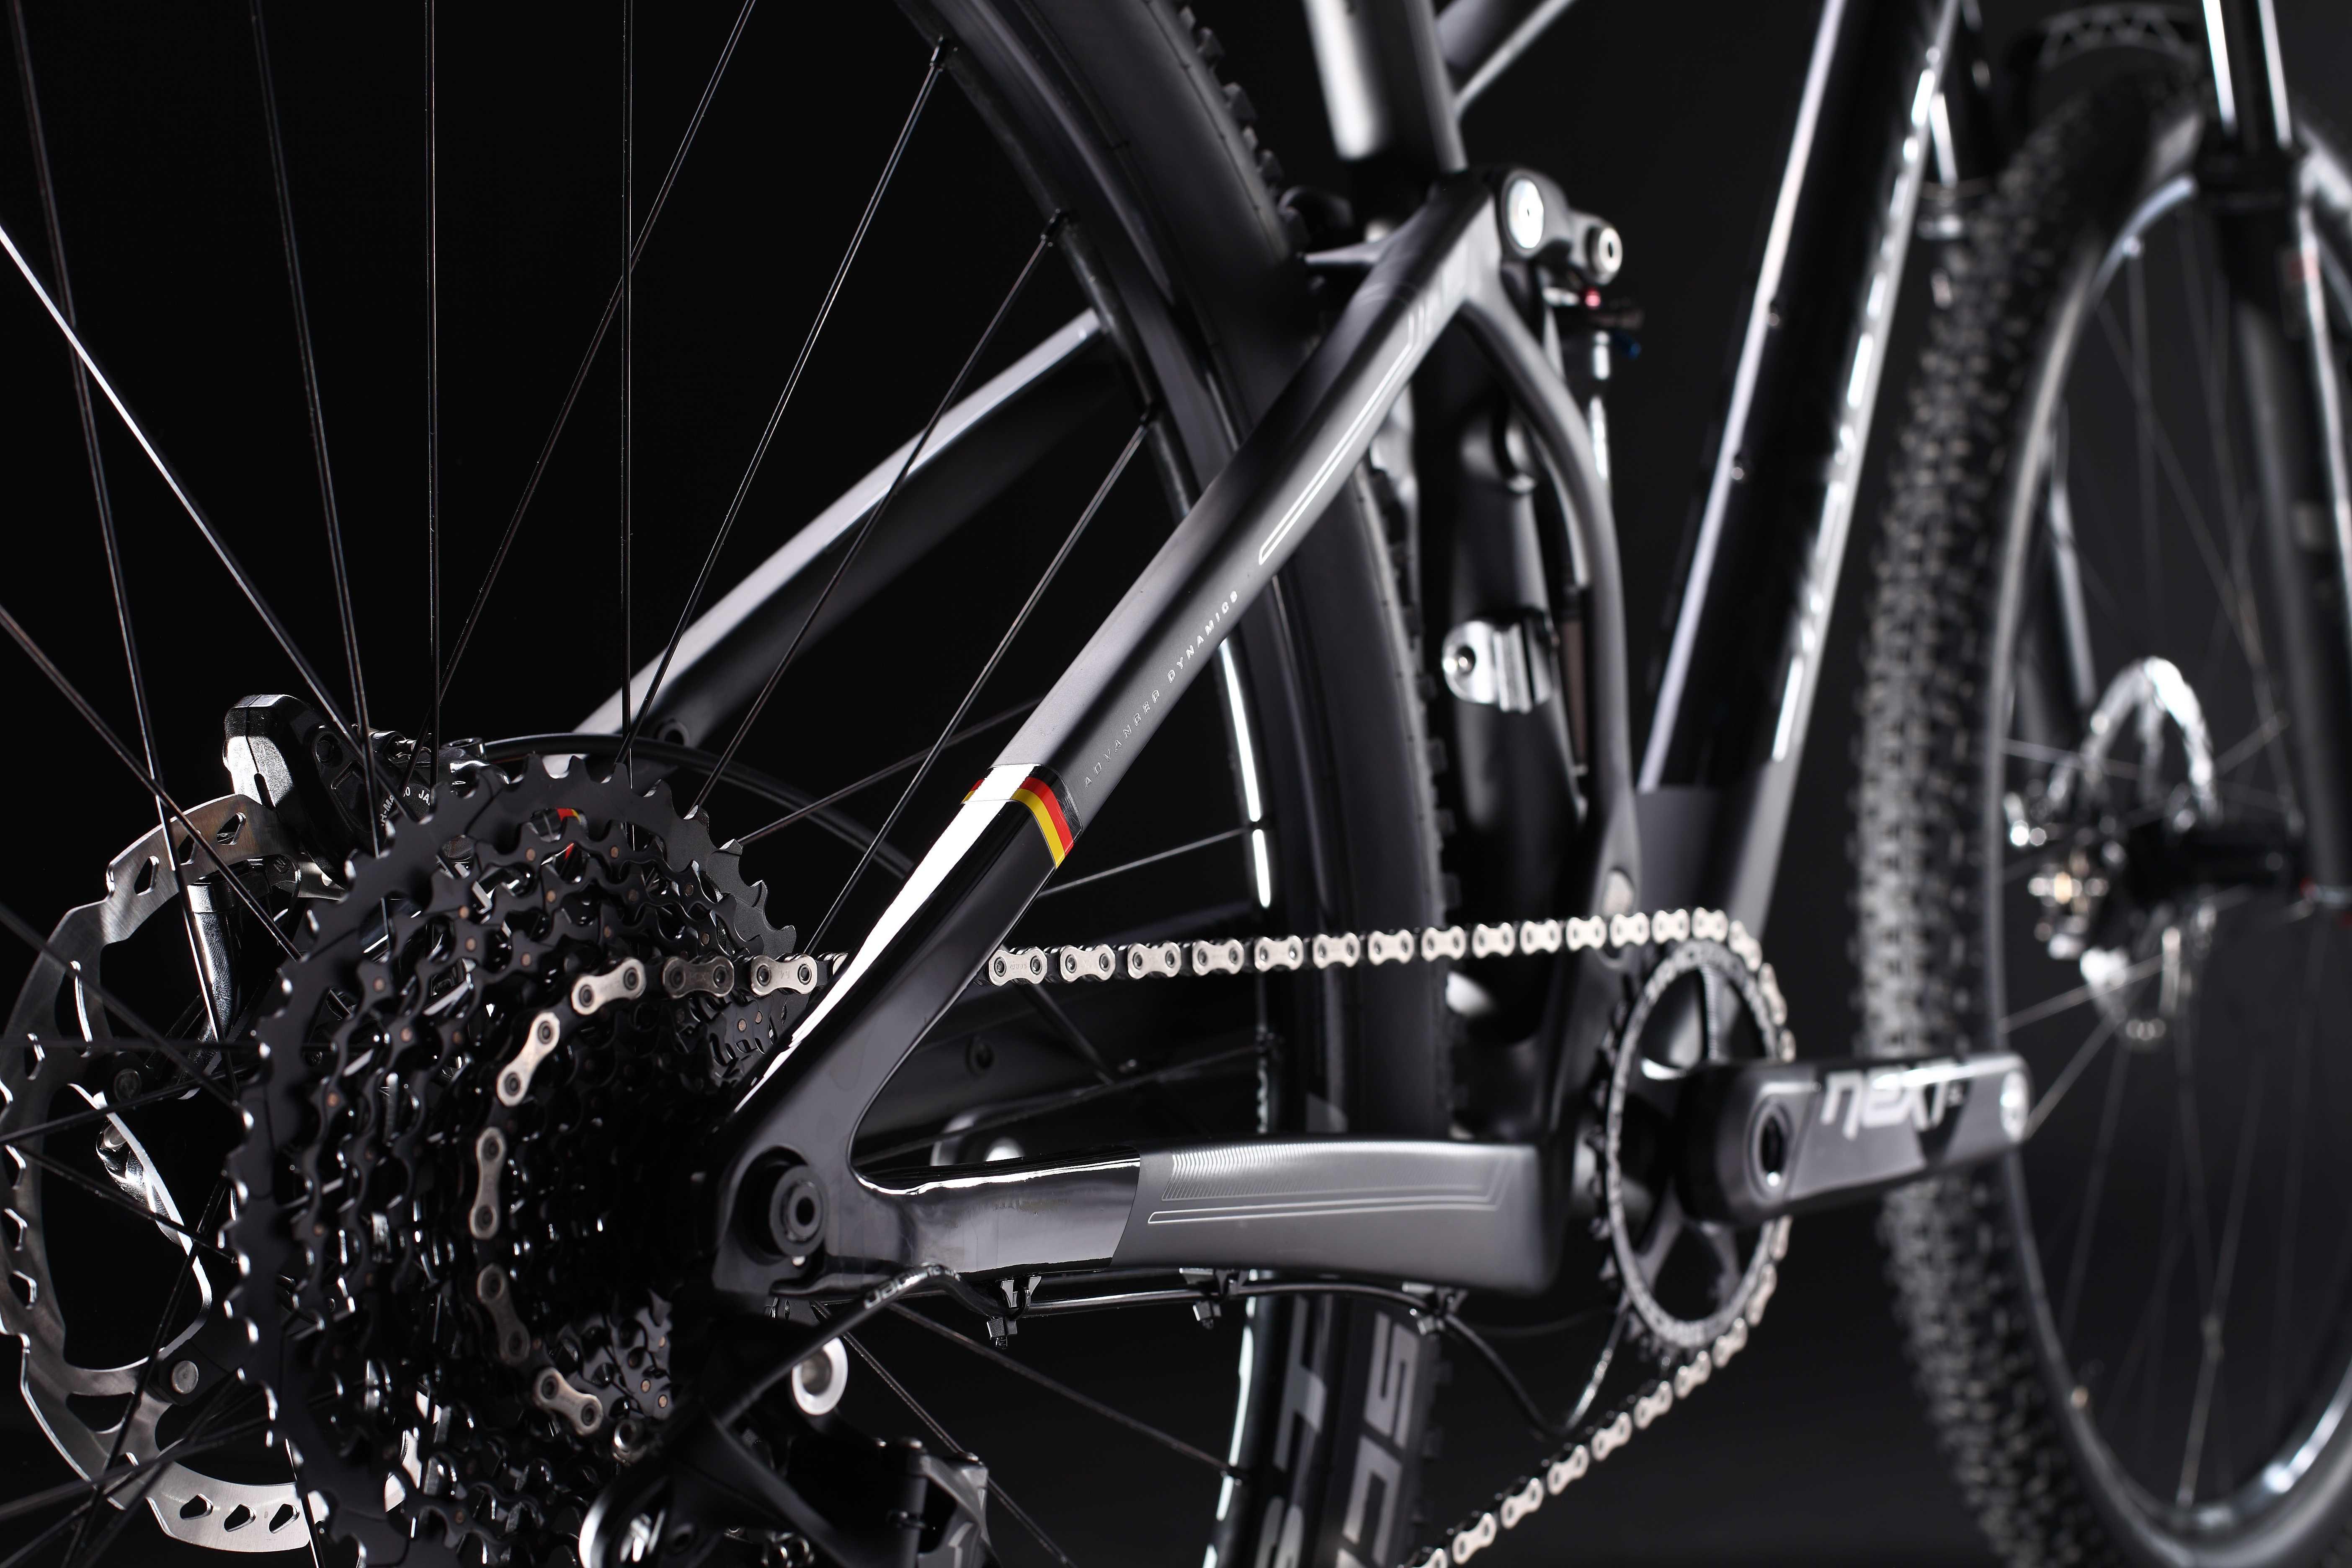 sesta-team-bike-closeup | Lightweight Performance Bicycles